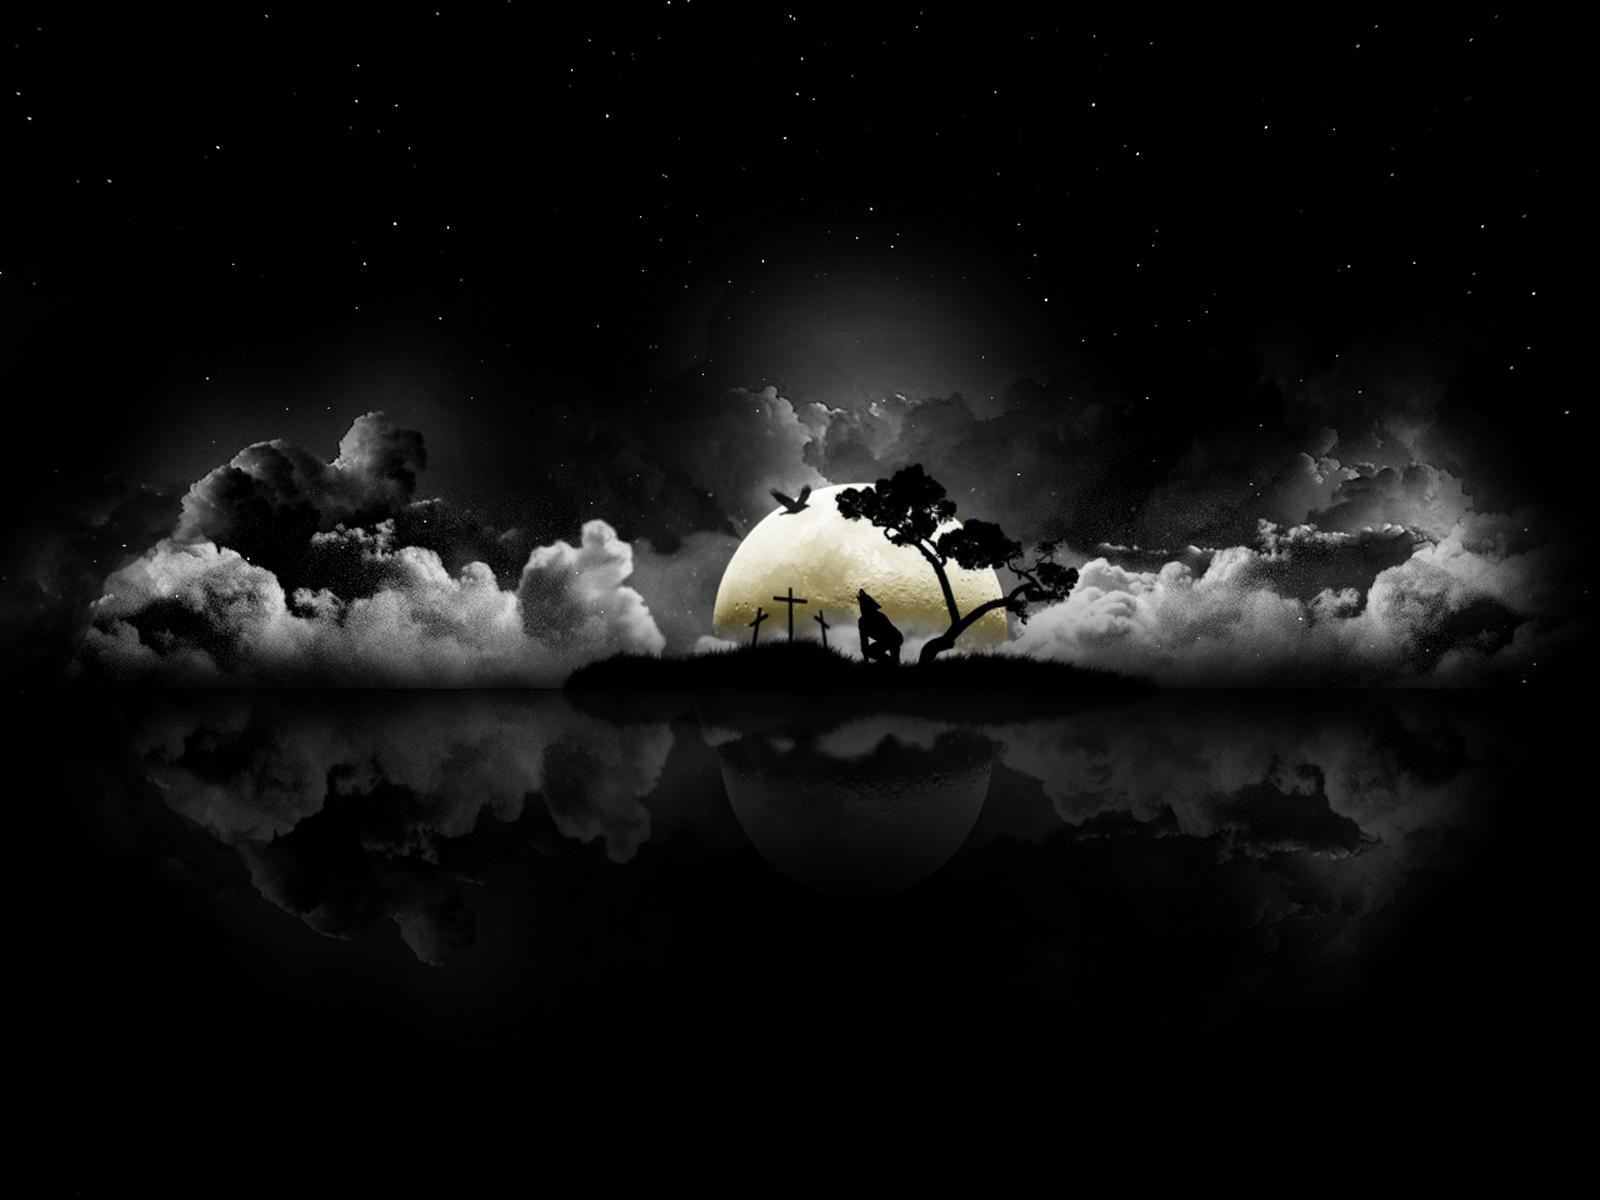 halloween moon wallpaper - photo #32